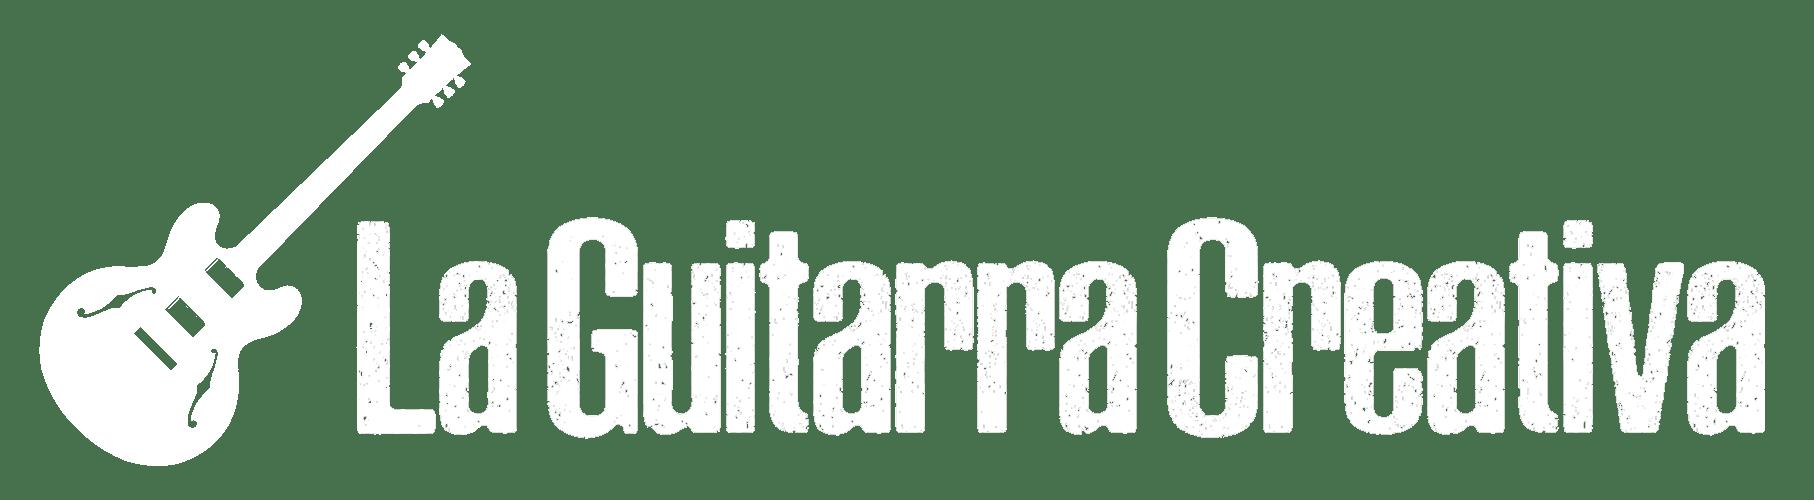 La Guitarra Creativa by Javier Aviles LOGO